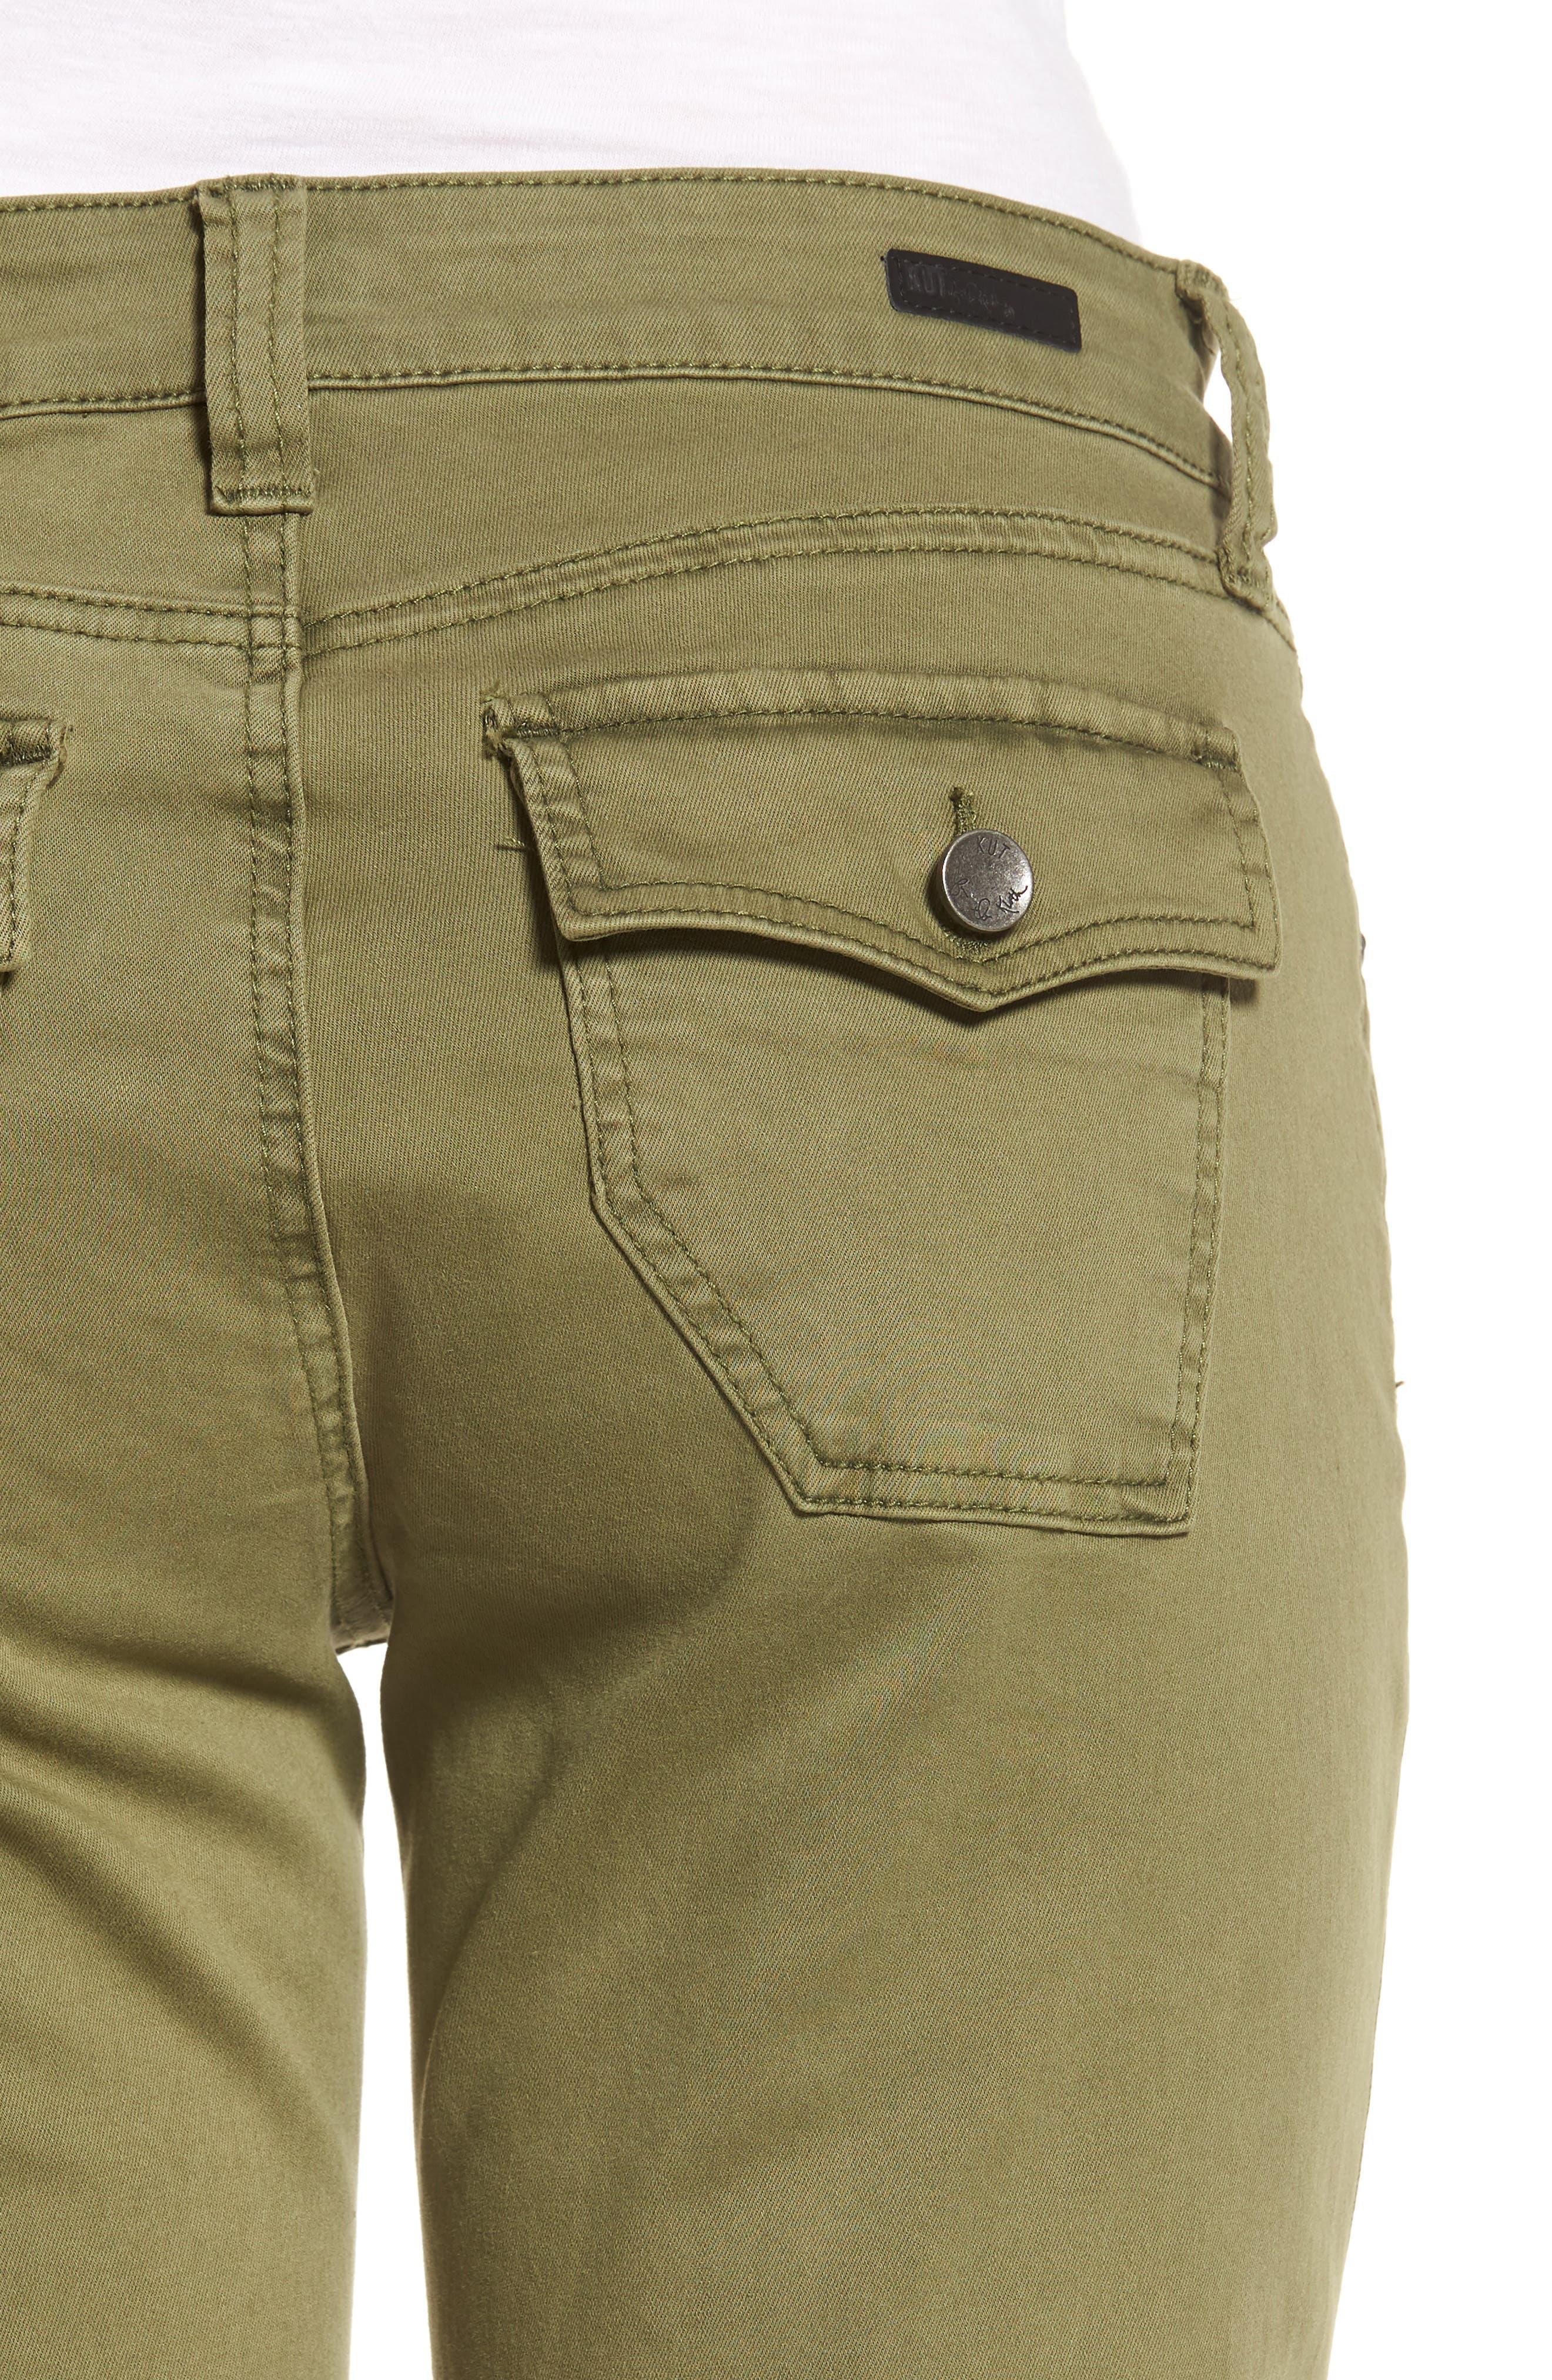 Natalie Bermuda Shorts,                             Alternate thumbnail 4, color,                             Olive